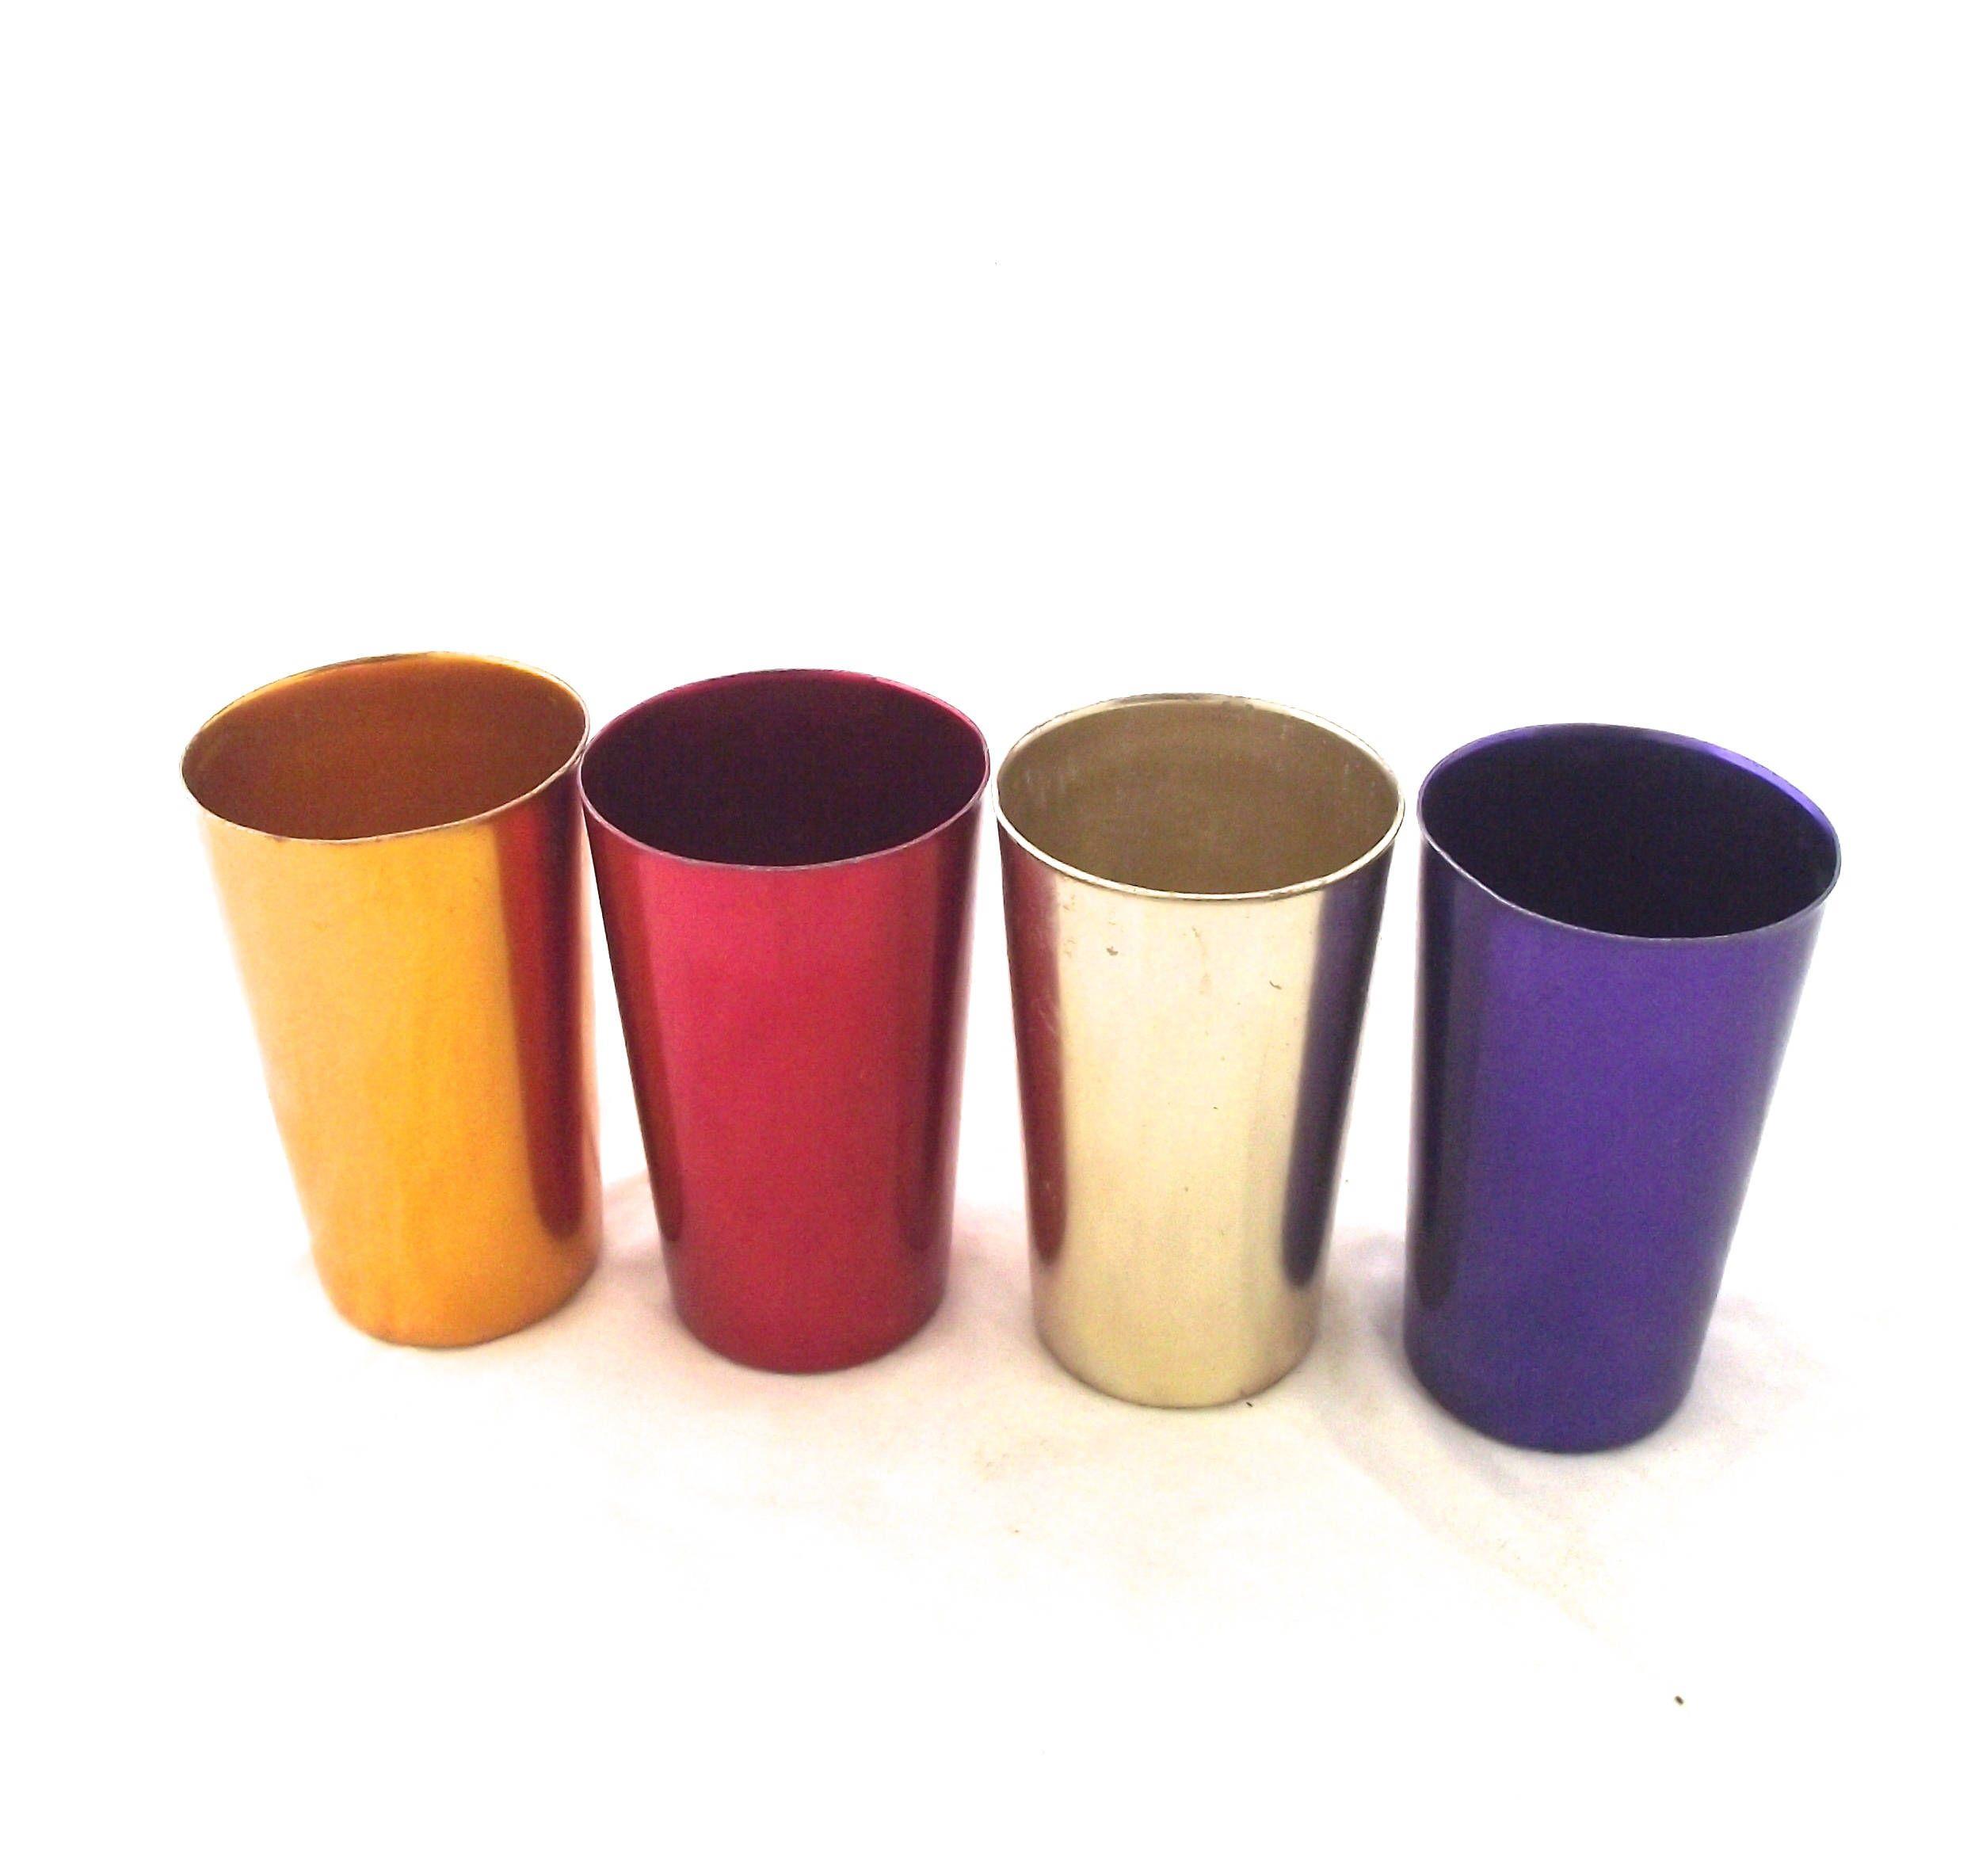 Bascal Jewel Tone Drinking Cups, Set Of 4 Vintage Metal Tumblers